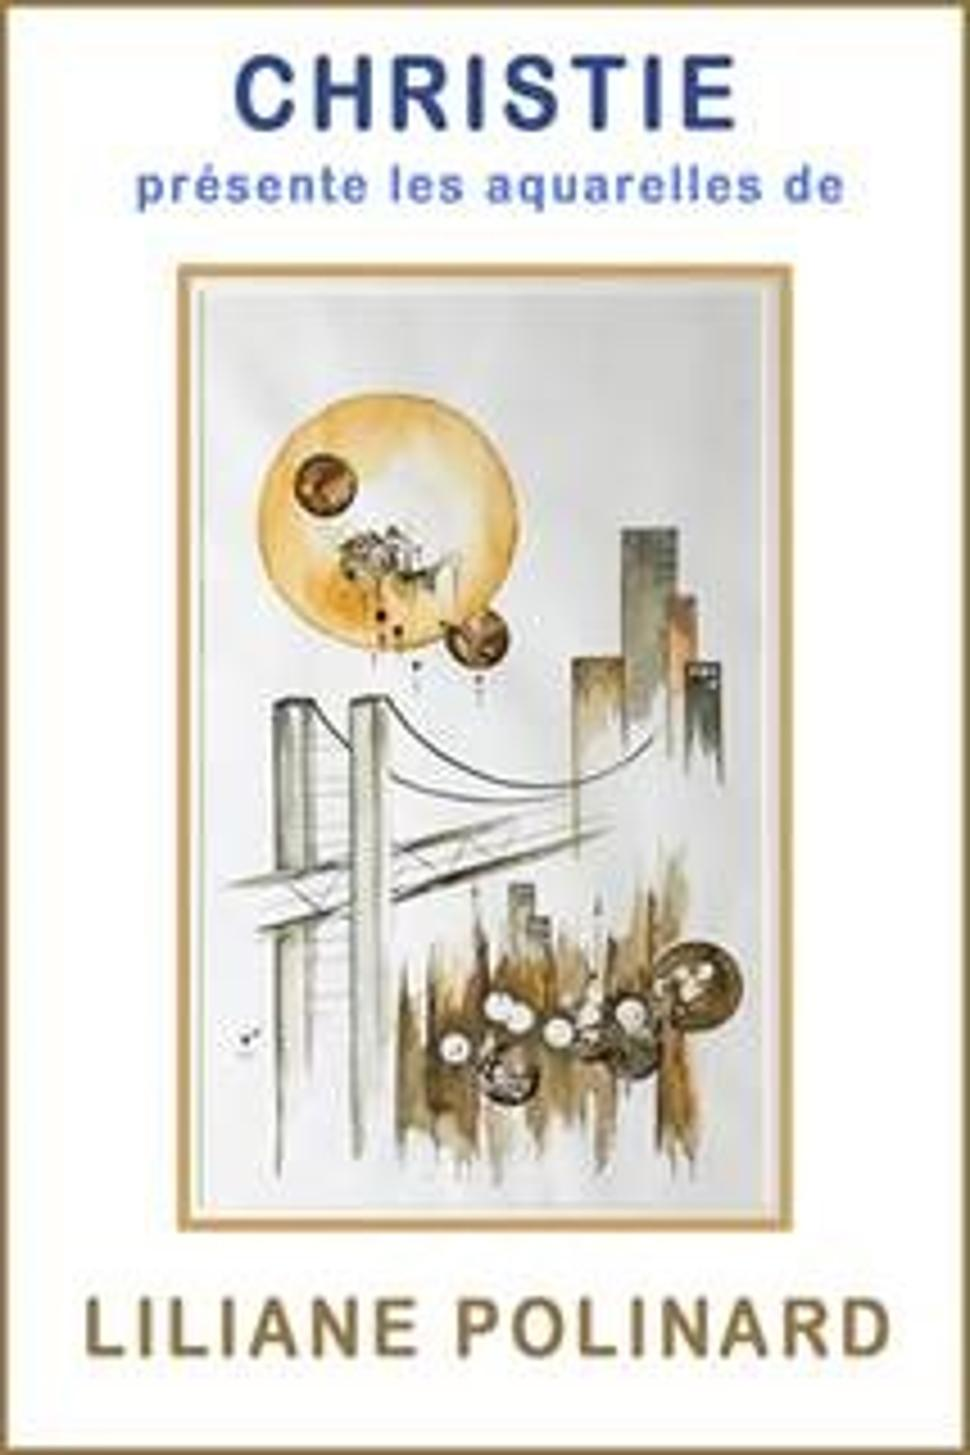 Exposition des œuvres de Anne Jadin, Liliane Polinard et Sylviane Fraiture 3©Christie Art 04-2021